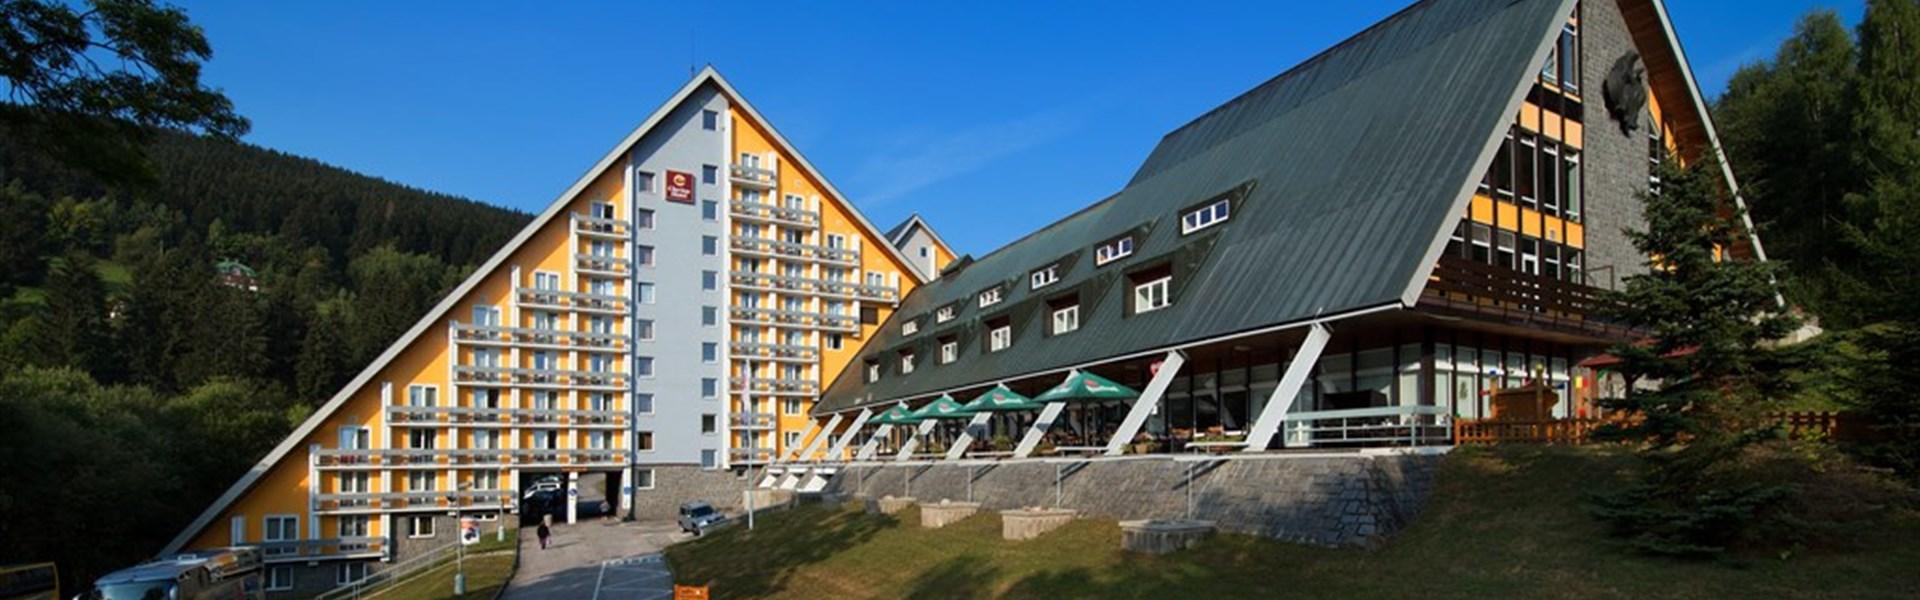 Clarion Hotel Špindlerův Mlýn -